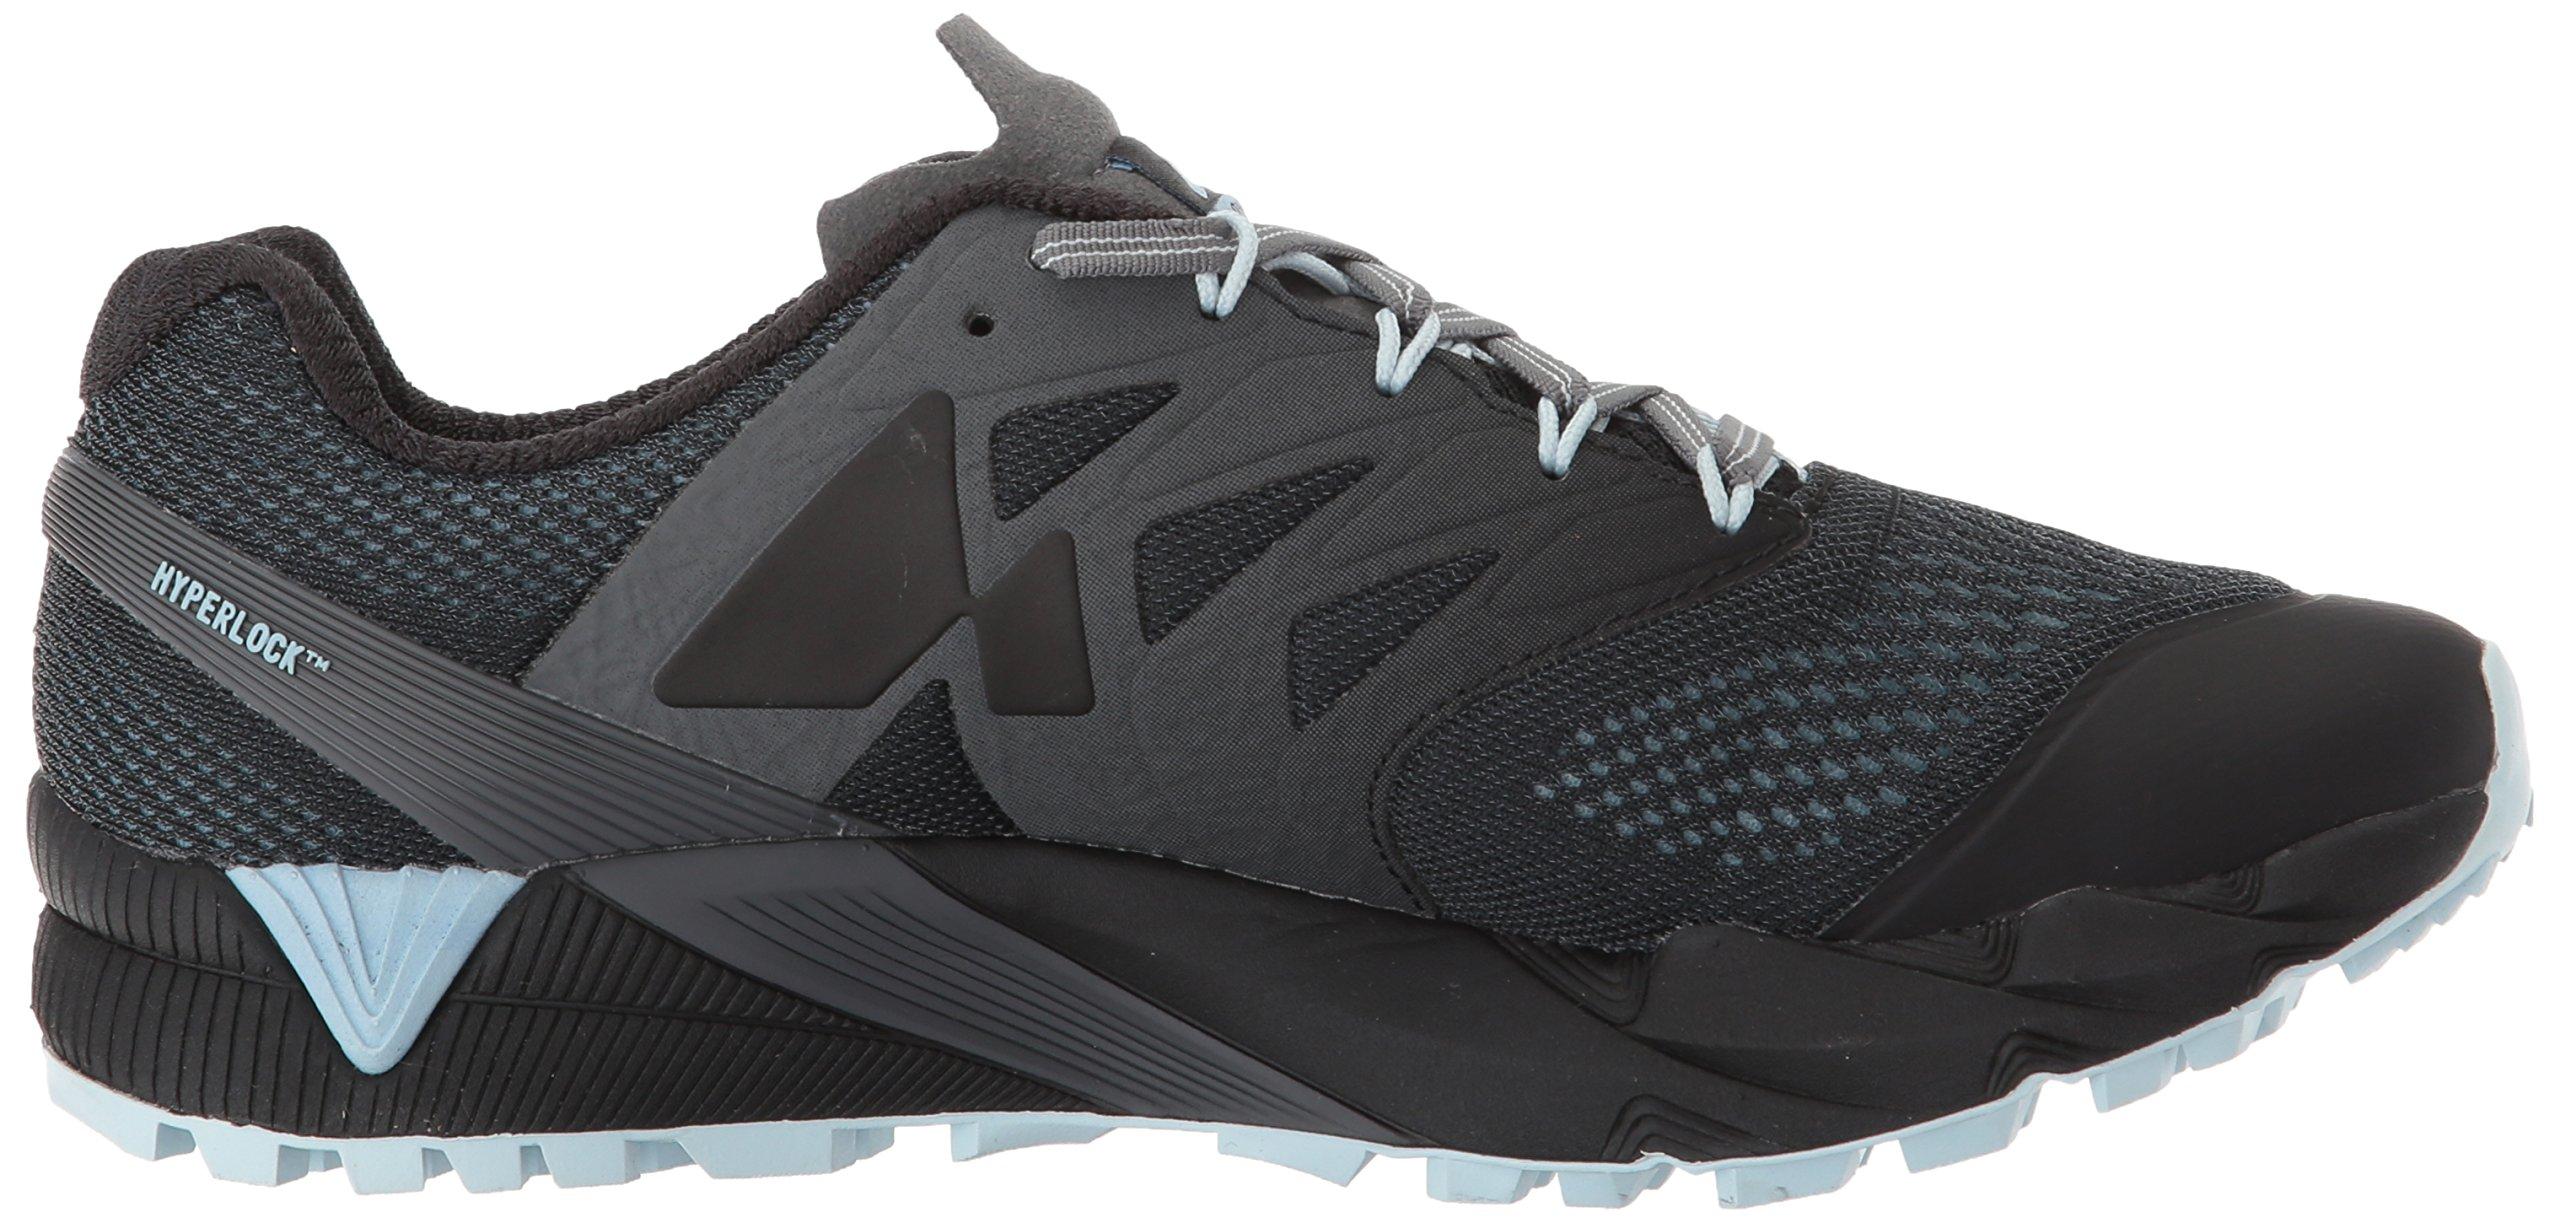 Merrell Women's Agility Peak Trail Running Shoes